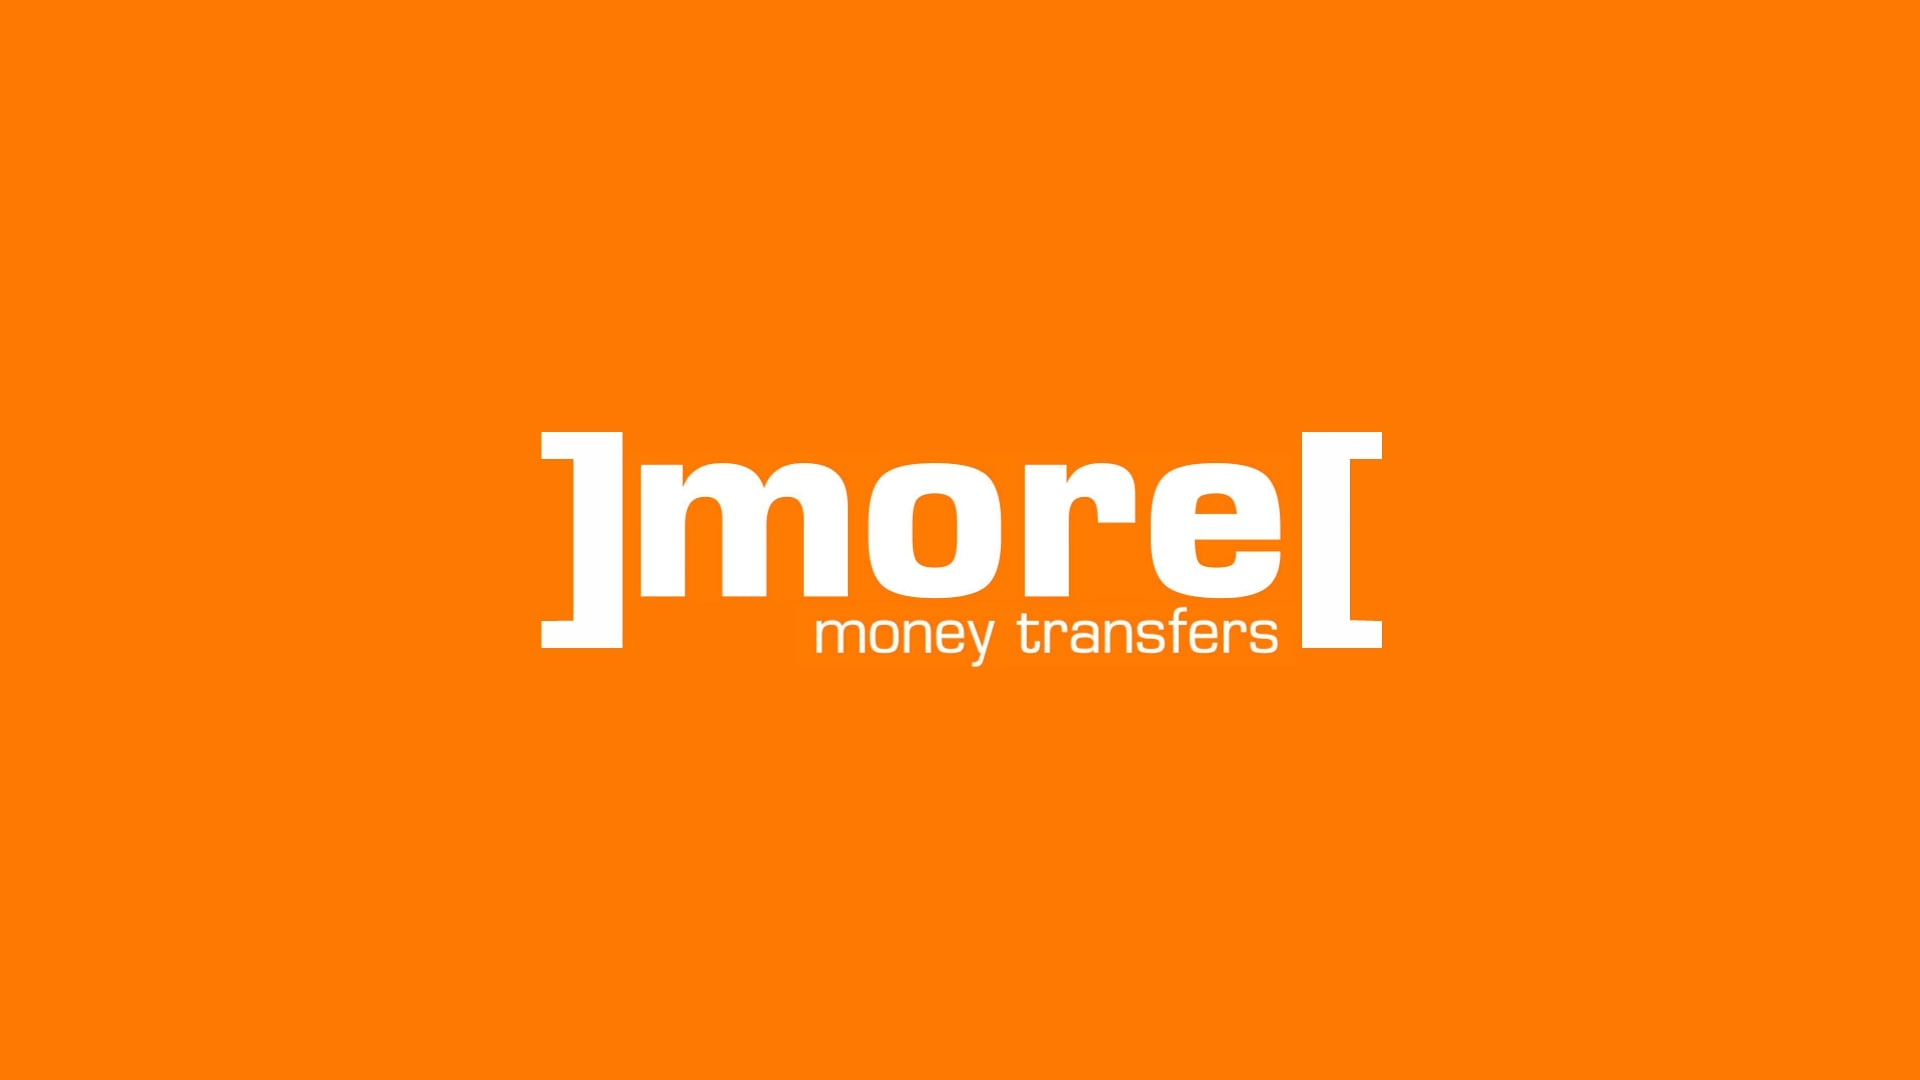 More Money Transfers